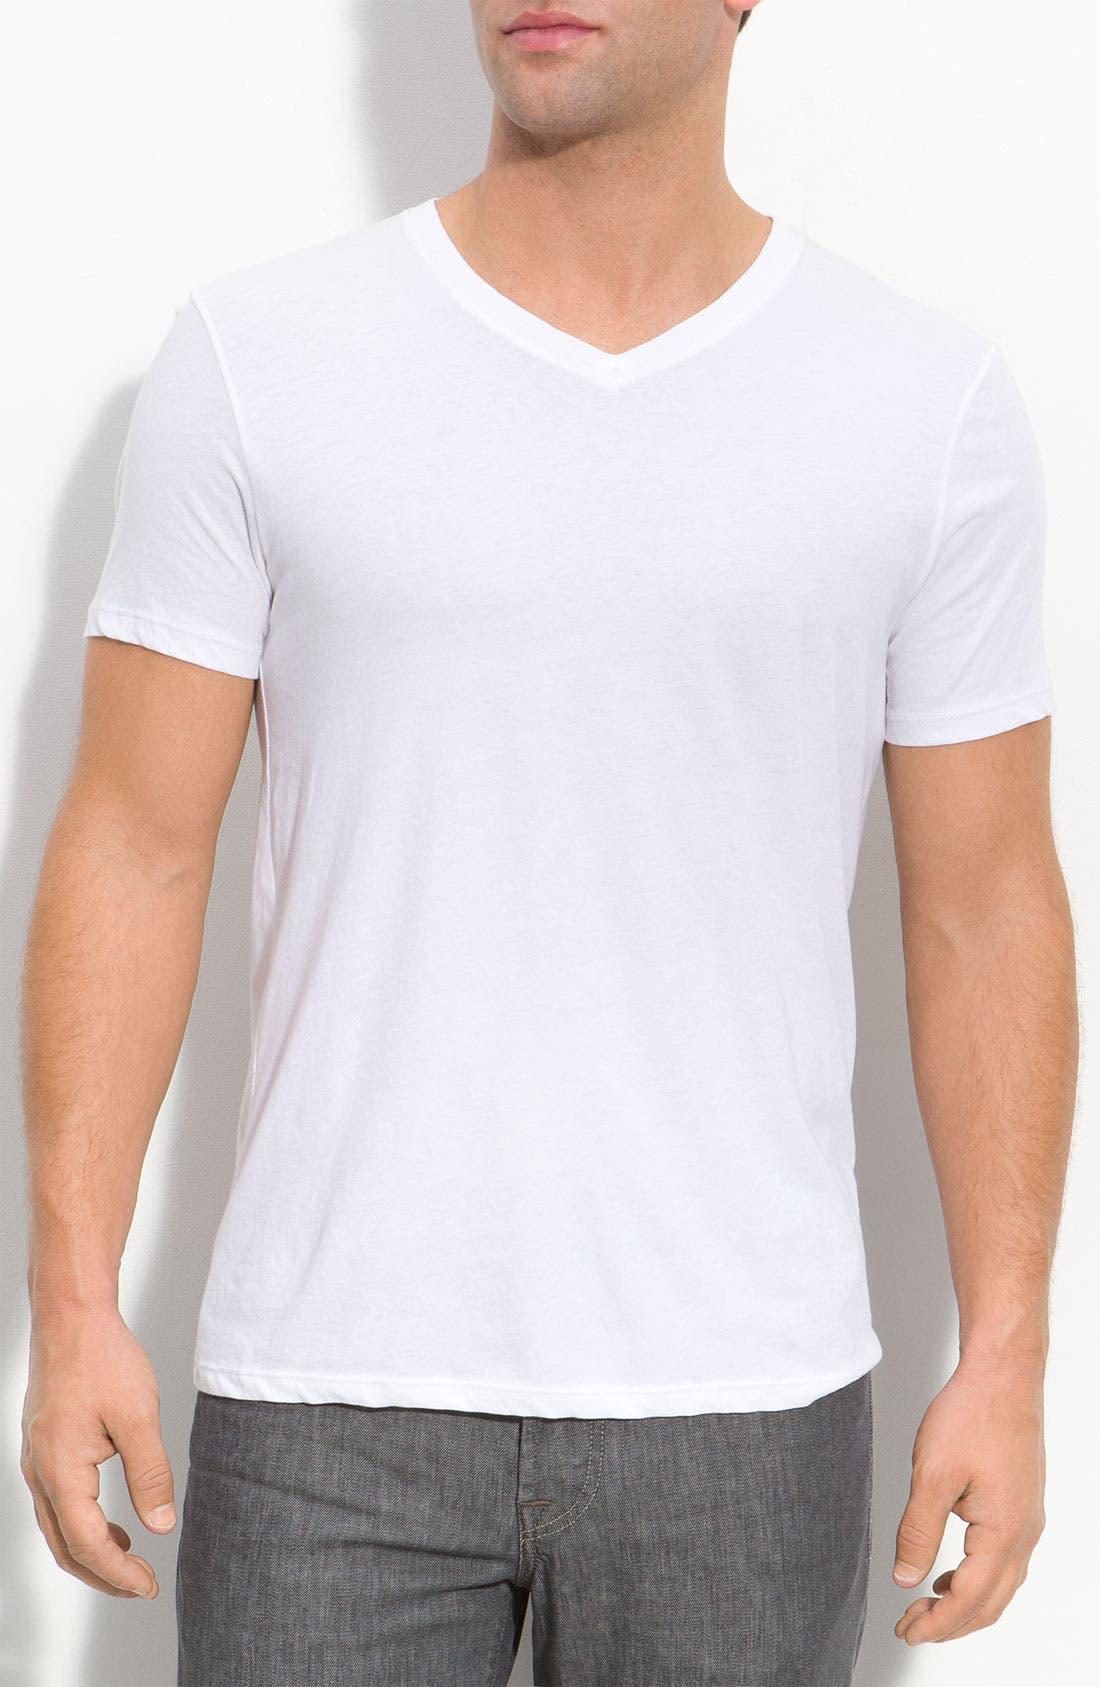 Alternate Image 1 Selected - Vince Short Sleeve T-Shirt